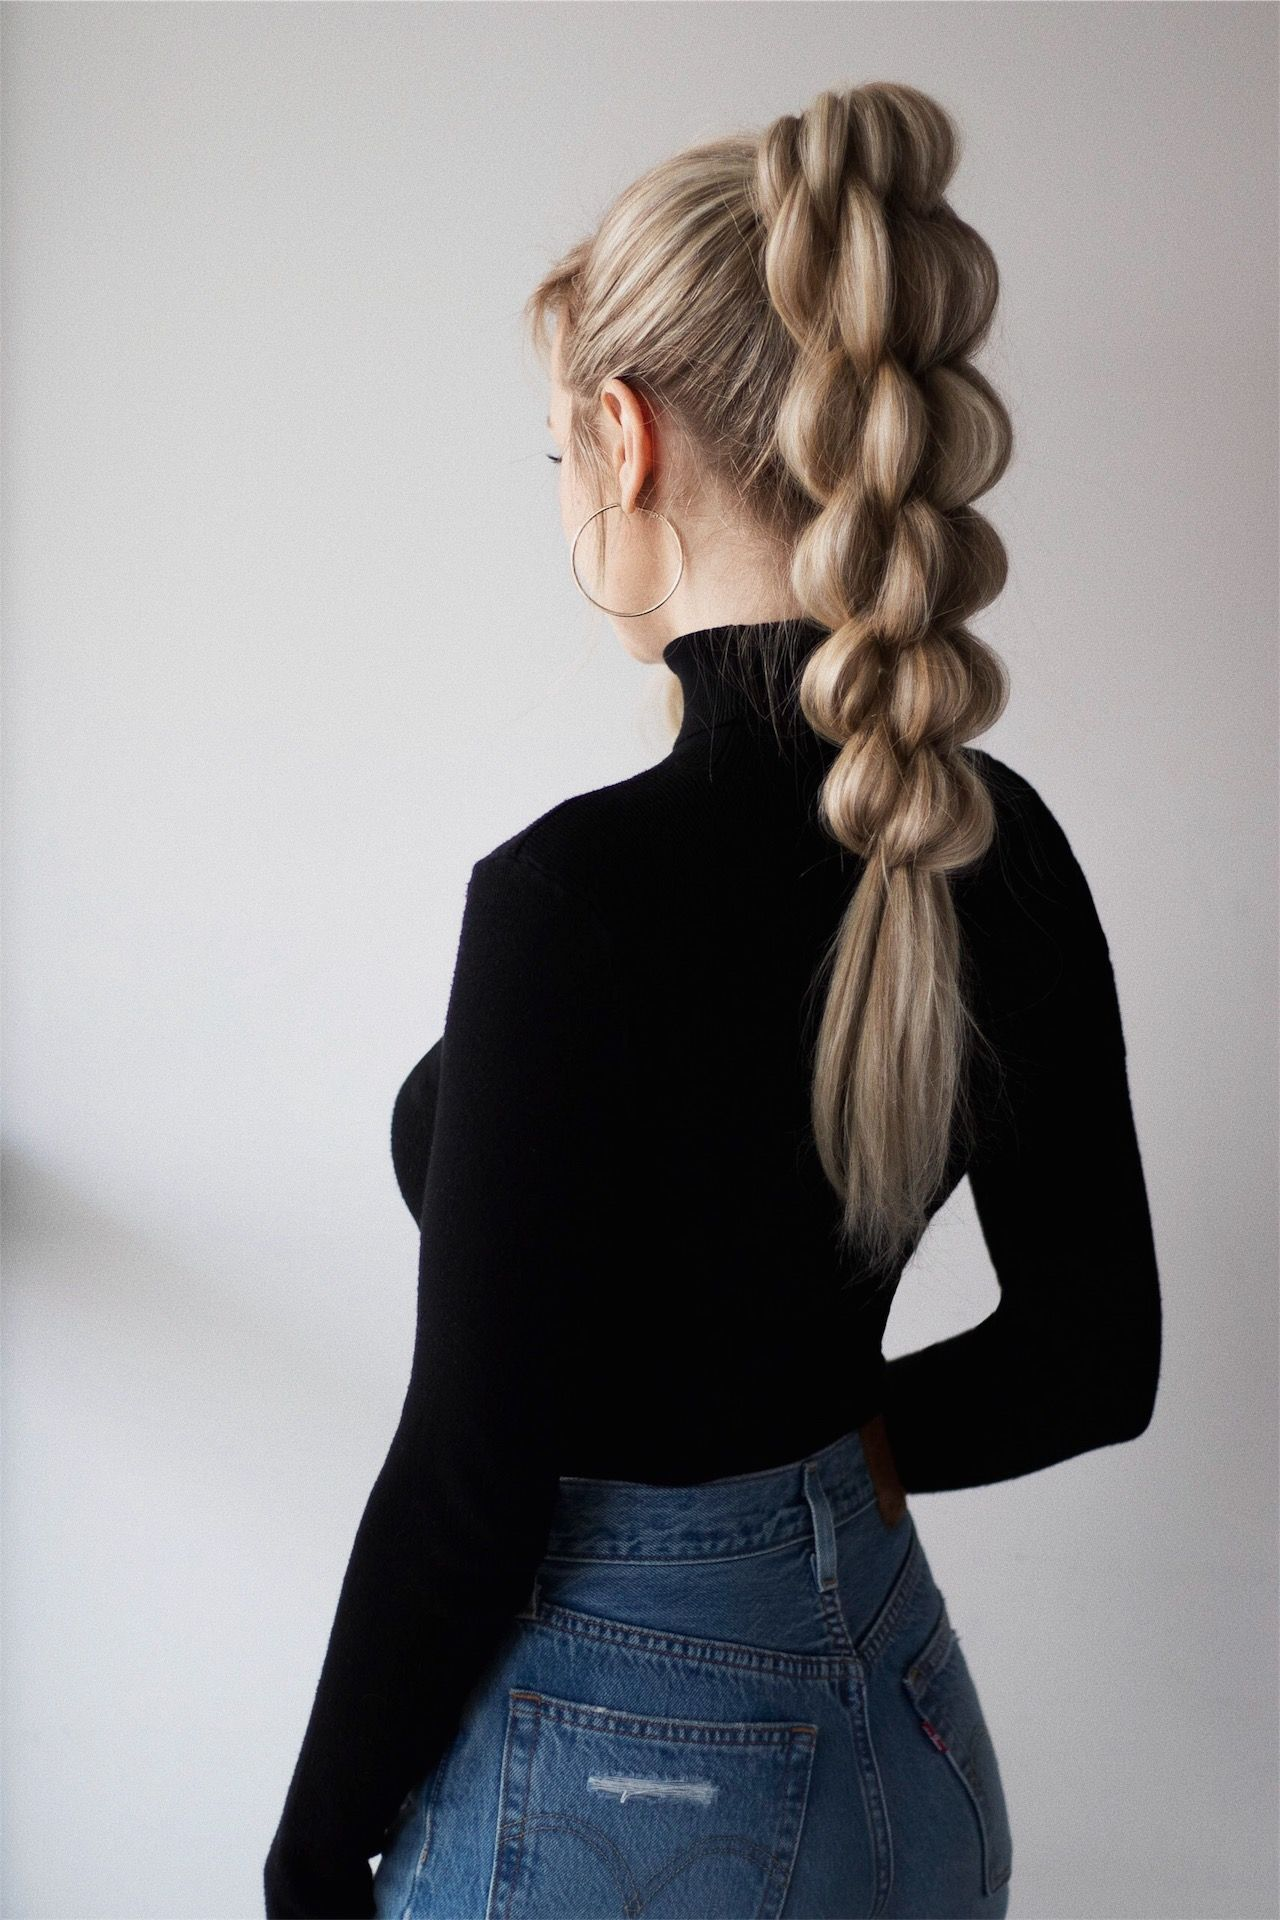 Braided Ponytail Hair Tutorial | Www.Ale - Hair Beauty